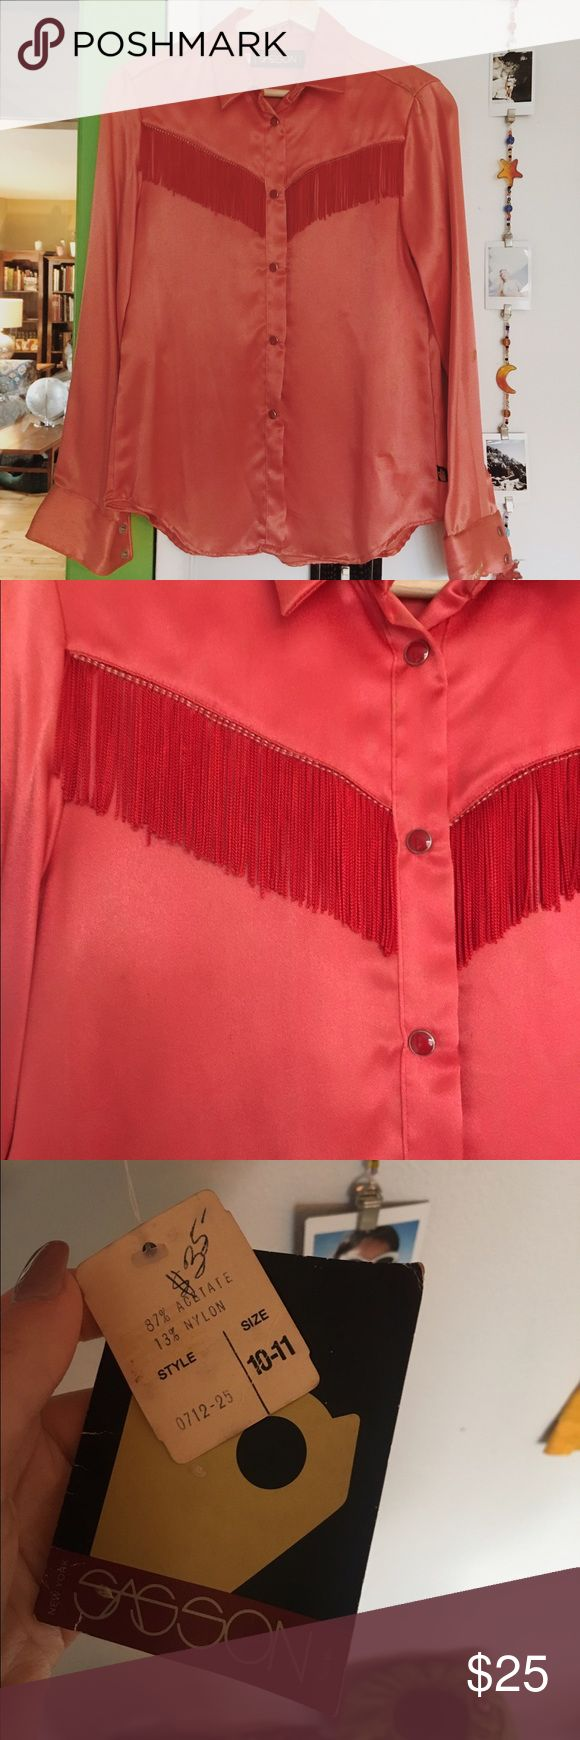 Vintage fringe blouse Bright red fierce af vintage button down, brand new vintage Tops Button Down Shirts